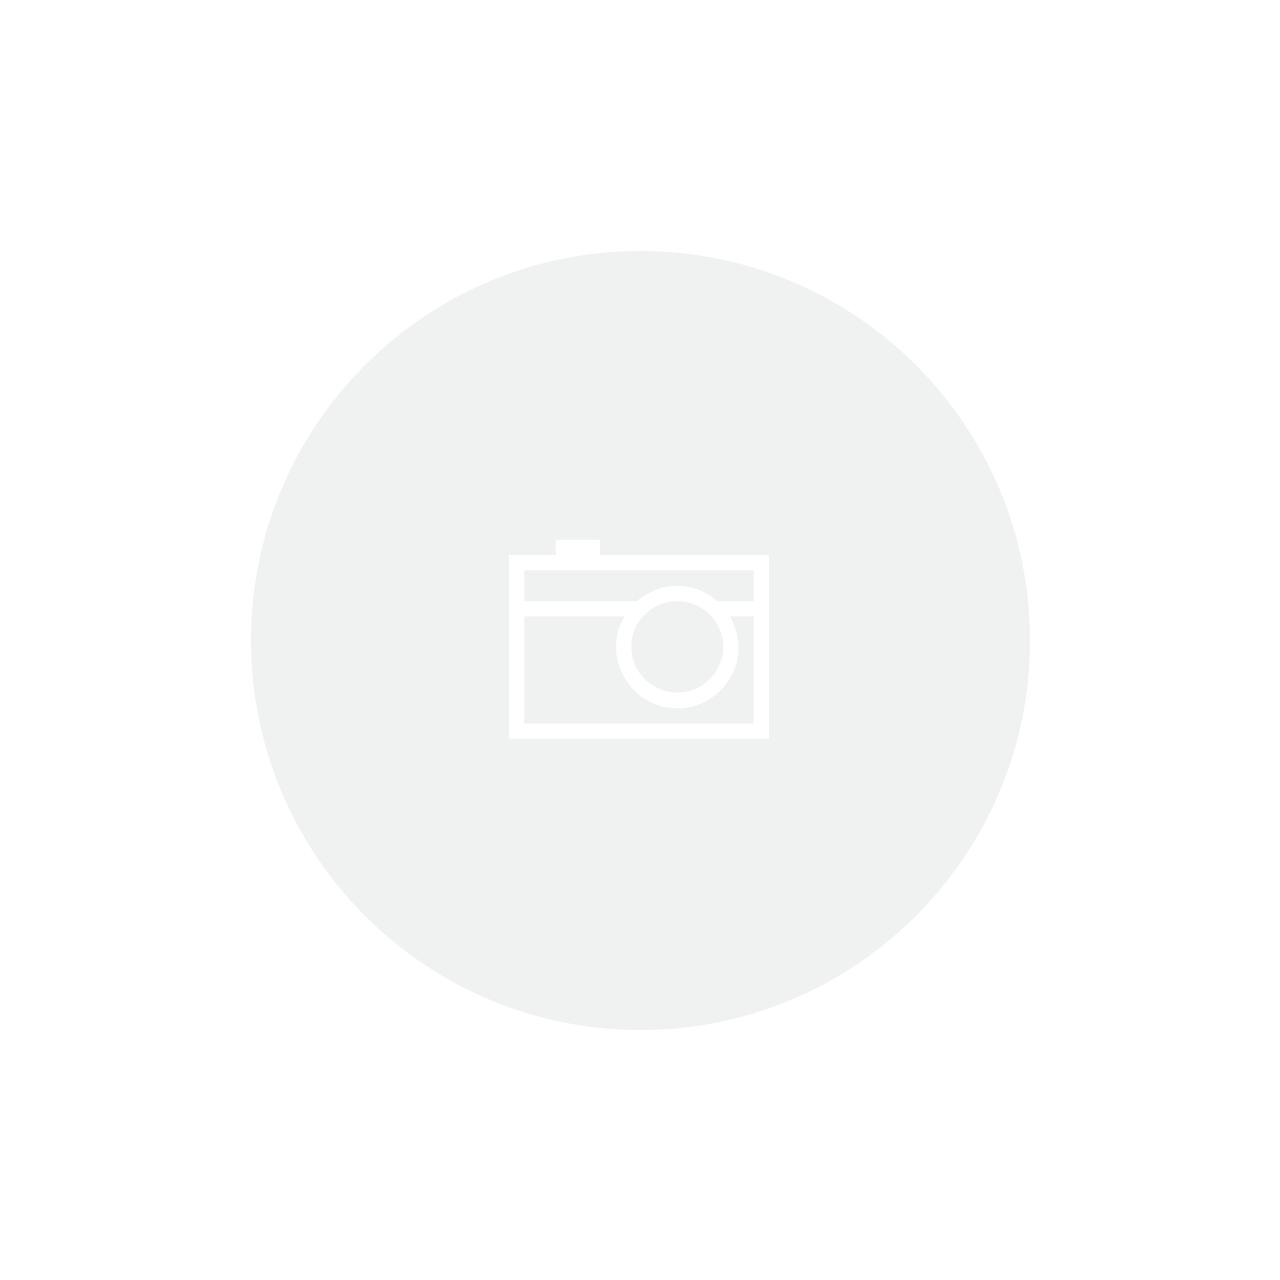 Açucareiro Aço Inox 2 Peças 0,35l  Continental Tramontina